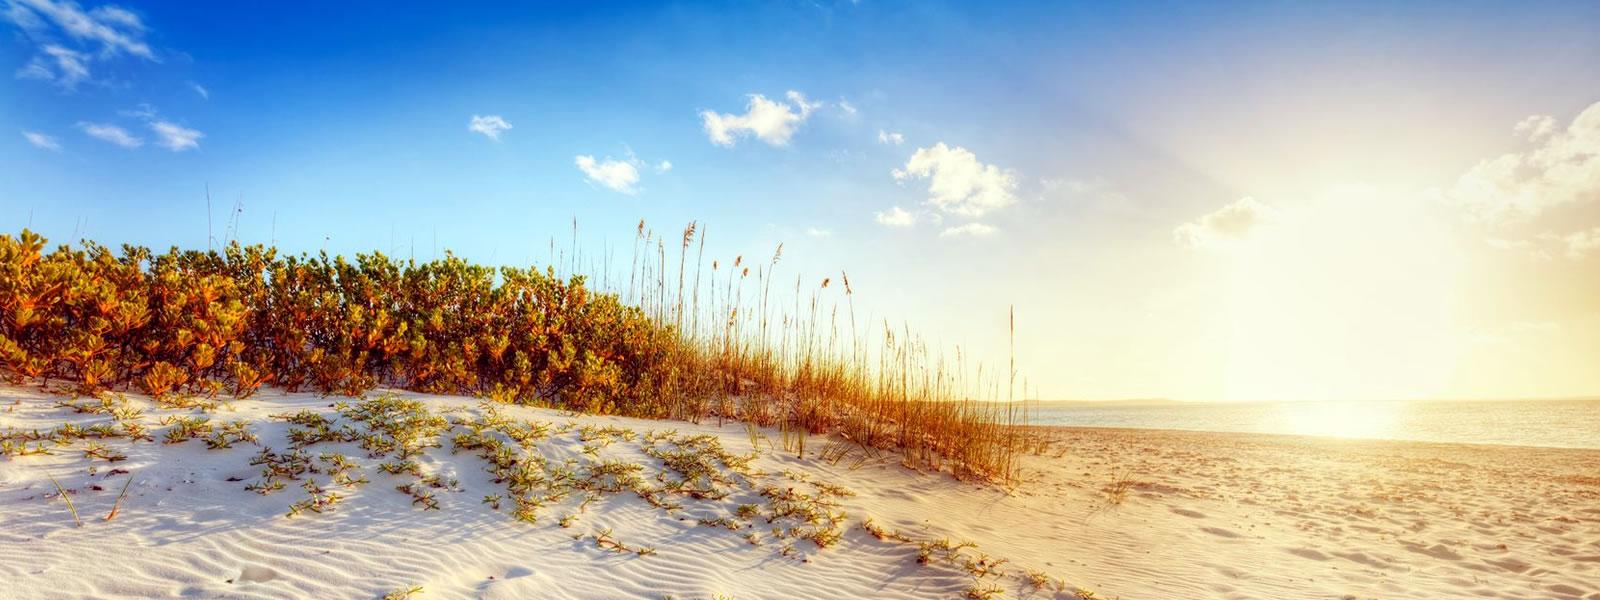 bg-beachdunes